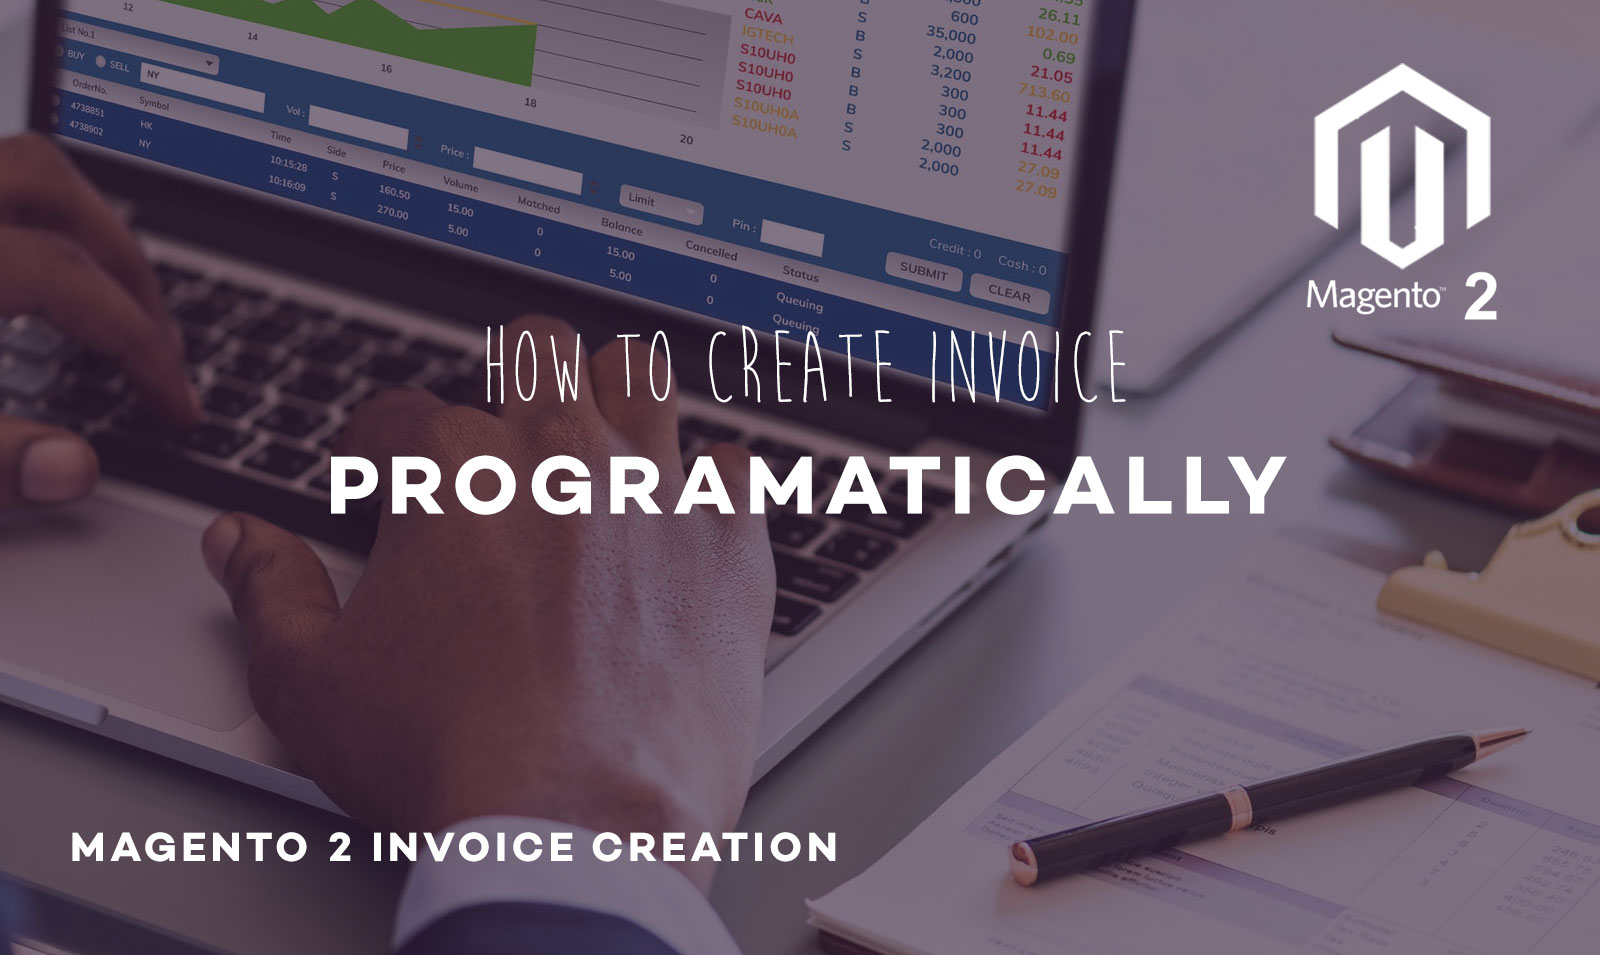 Magento 2 : How to create invoice programatically?